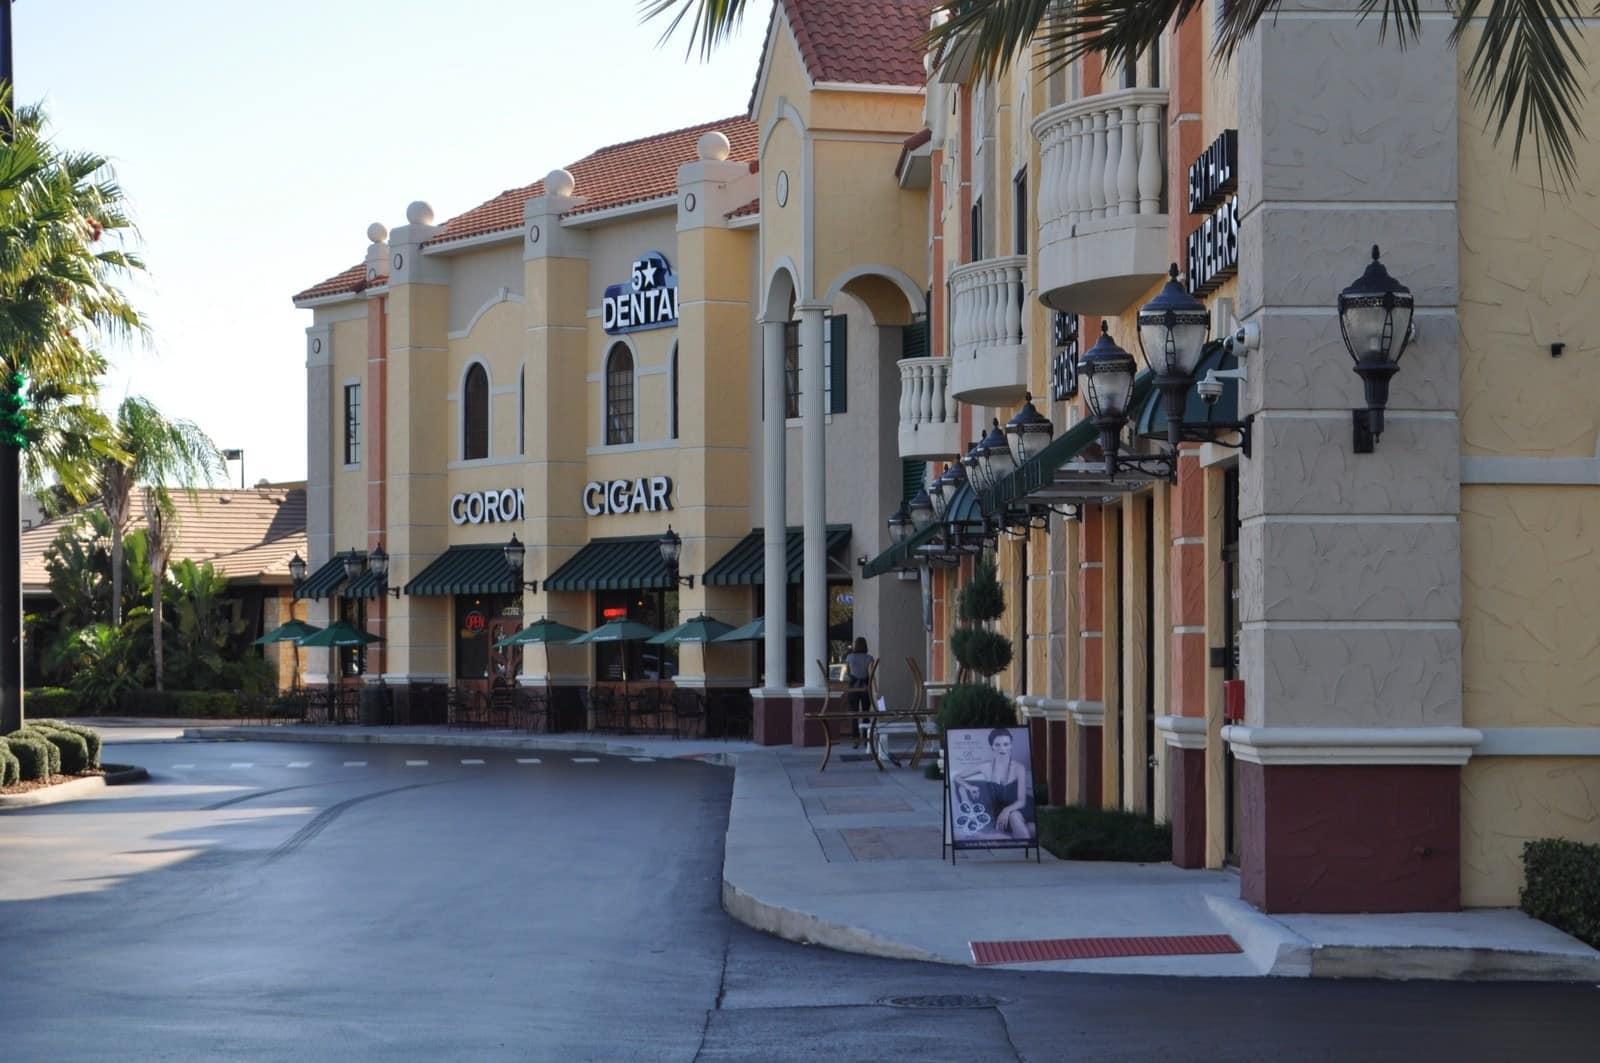 Restaurant Row Sandlake Road Orlando